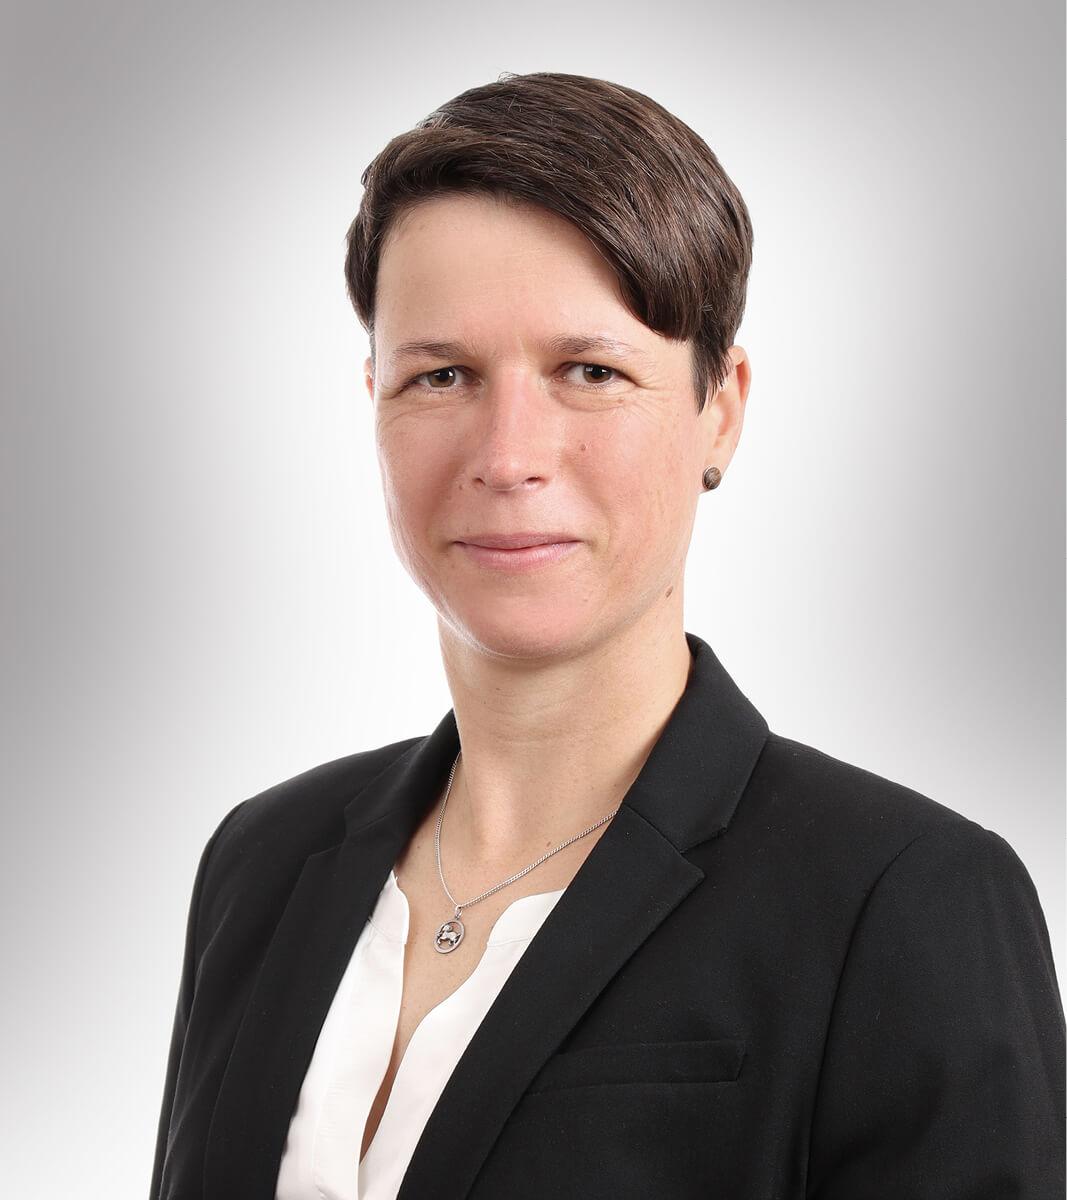 Sandra Eckert Diätassistentin bei Dorfner Catering